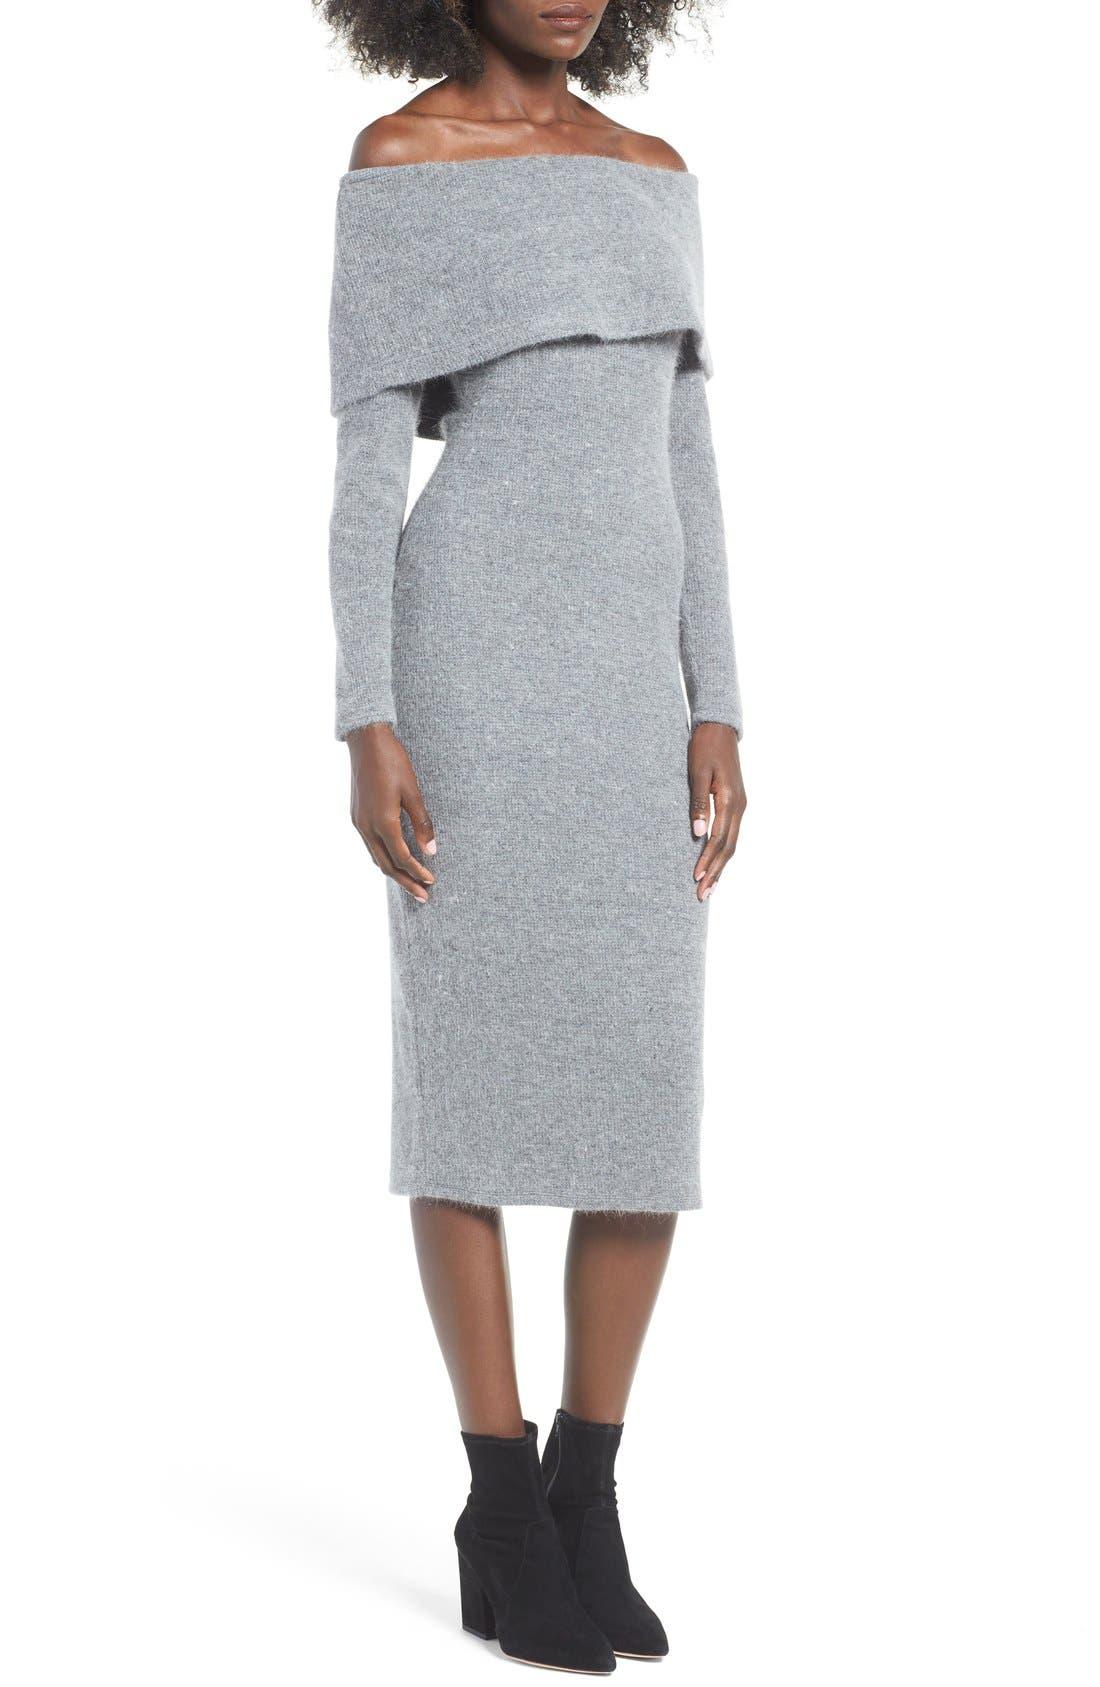 Alternate Image 1 Selected - J.O.A. Off the Shoulder Sweater Dress